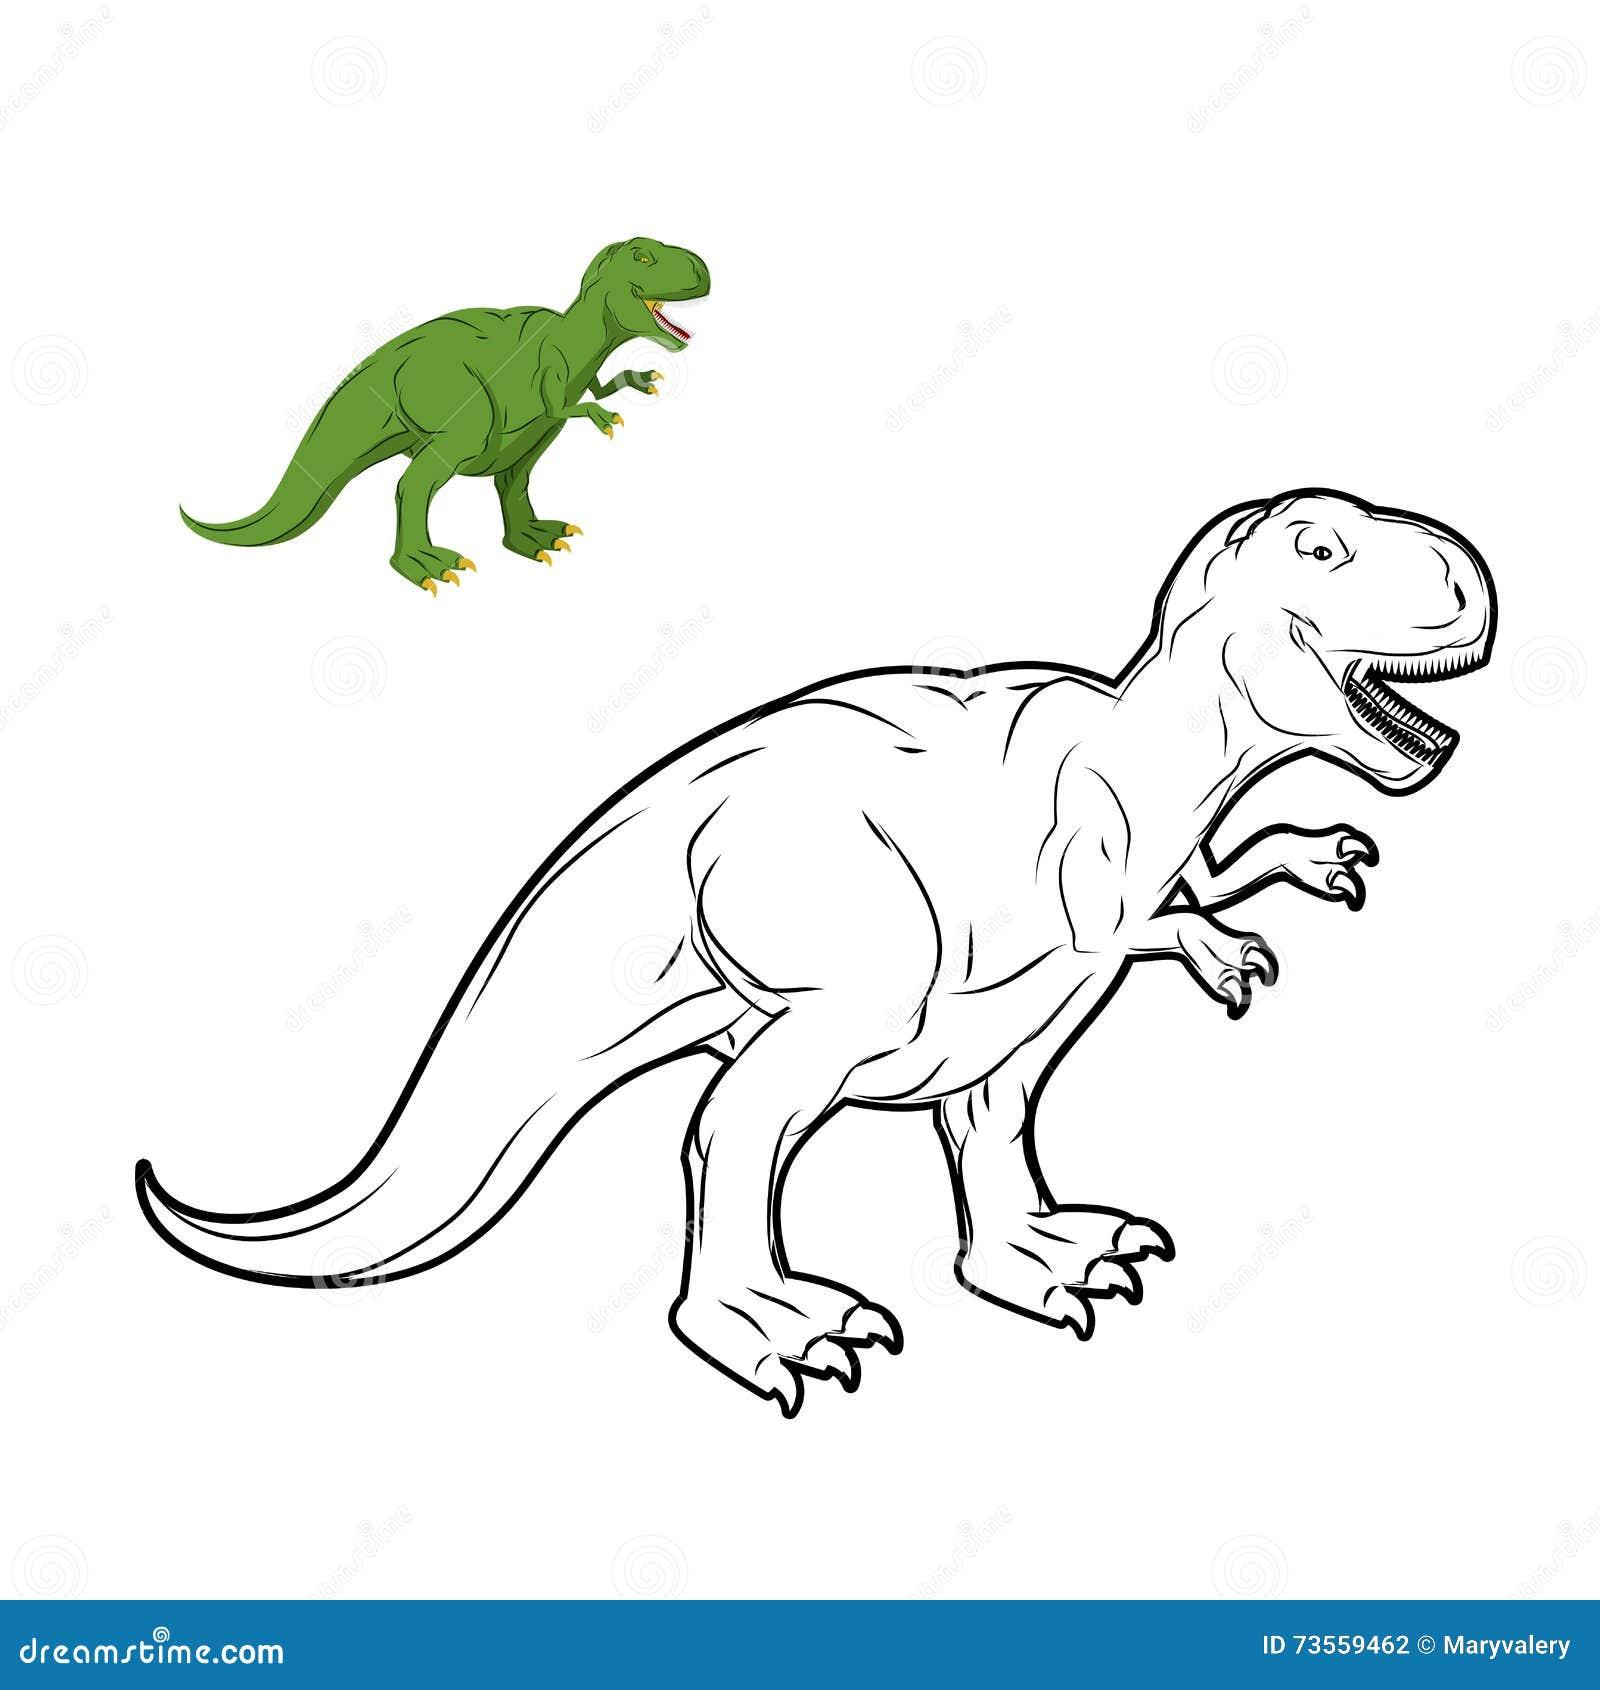 Livre Coloriage Dinosaure.Livre De Coloriage De Dinosaure De Rex De Tyrannosaure Illustration